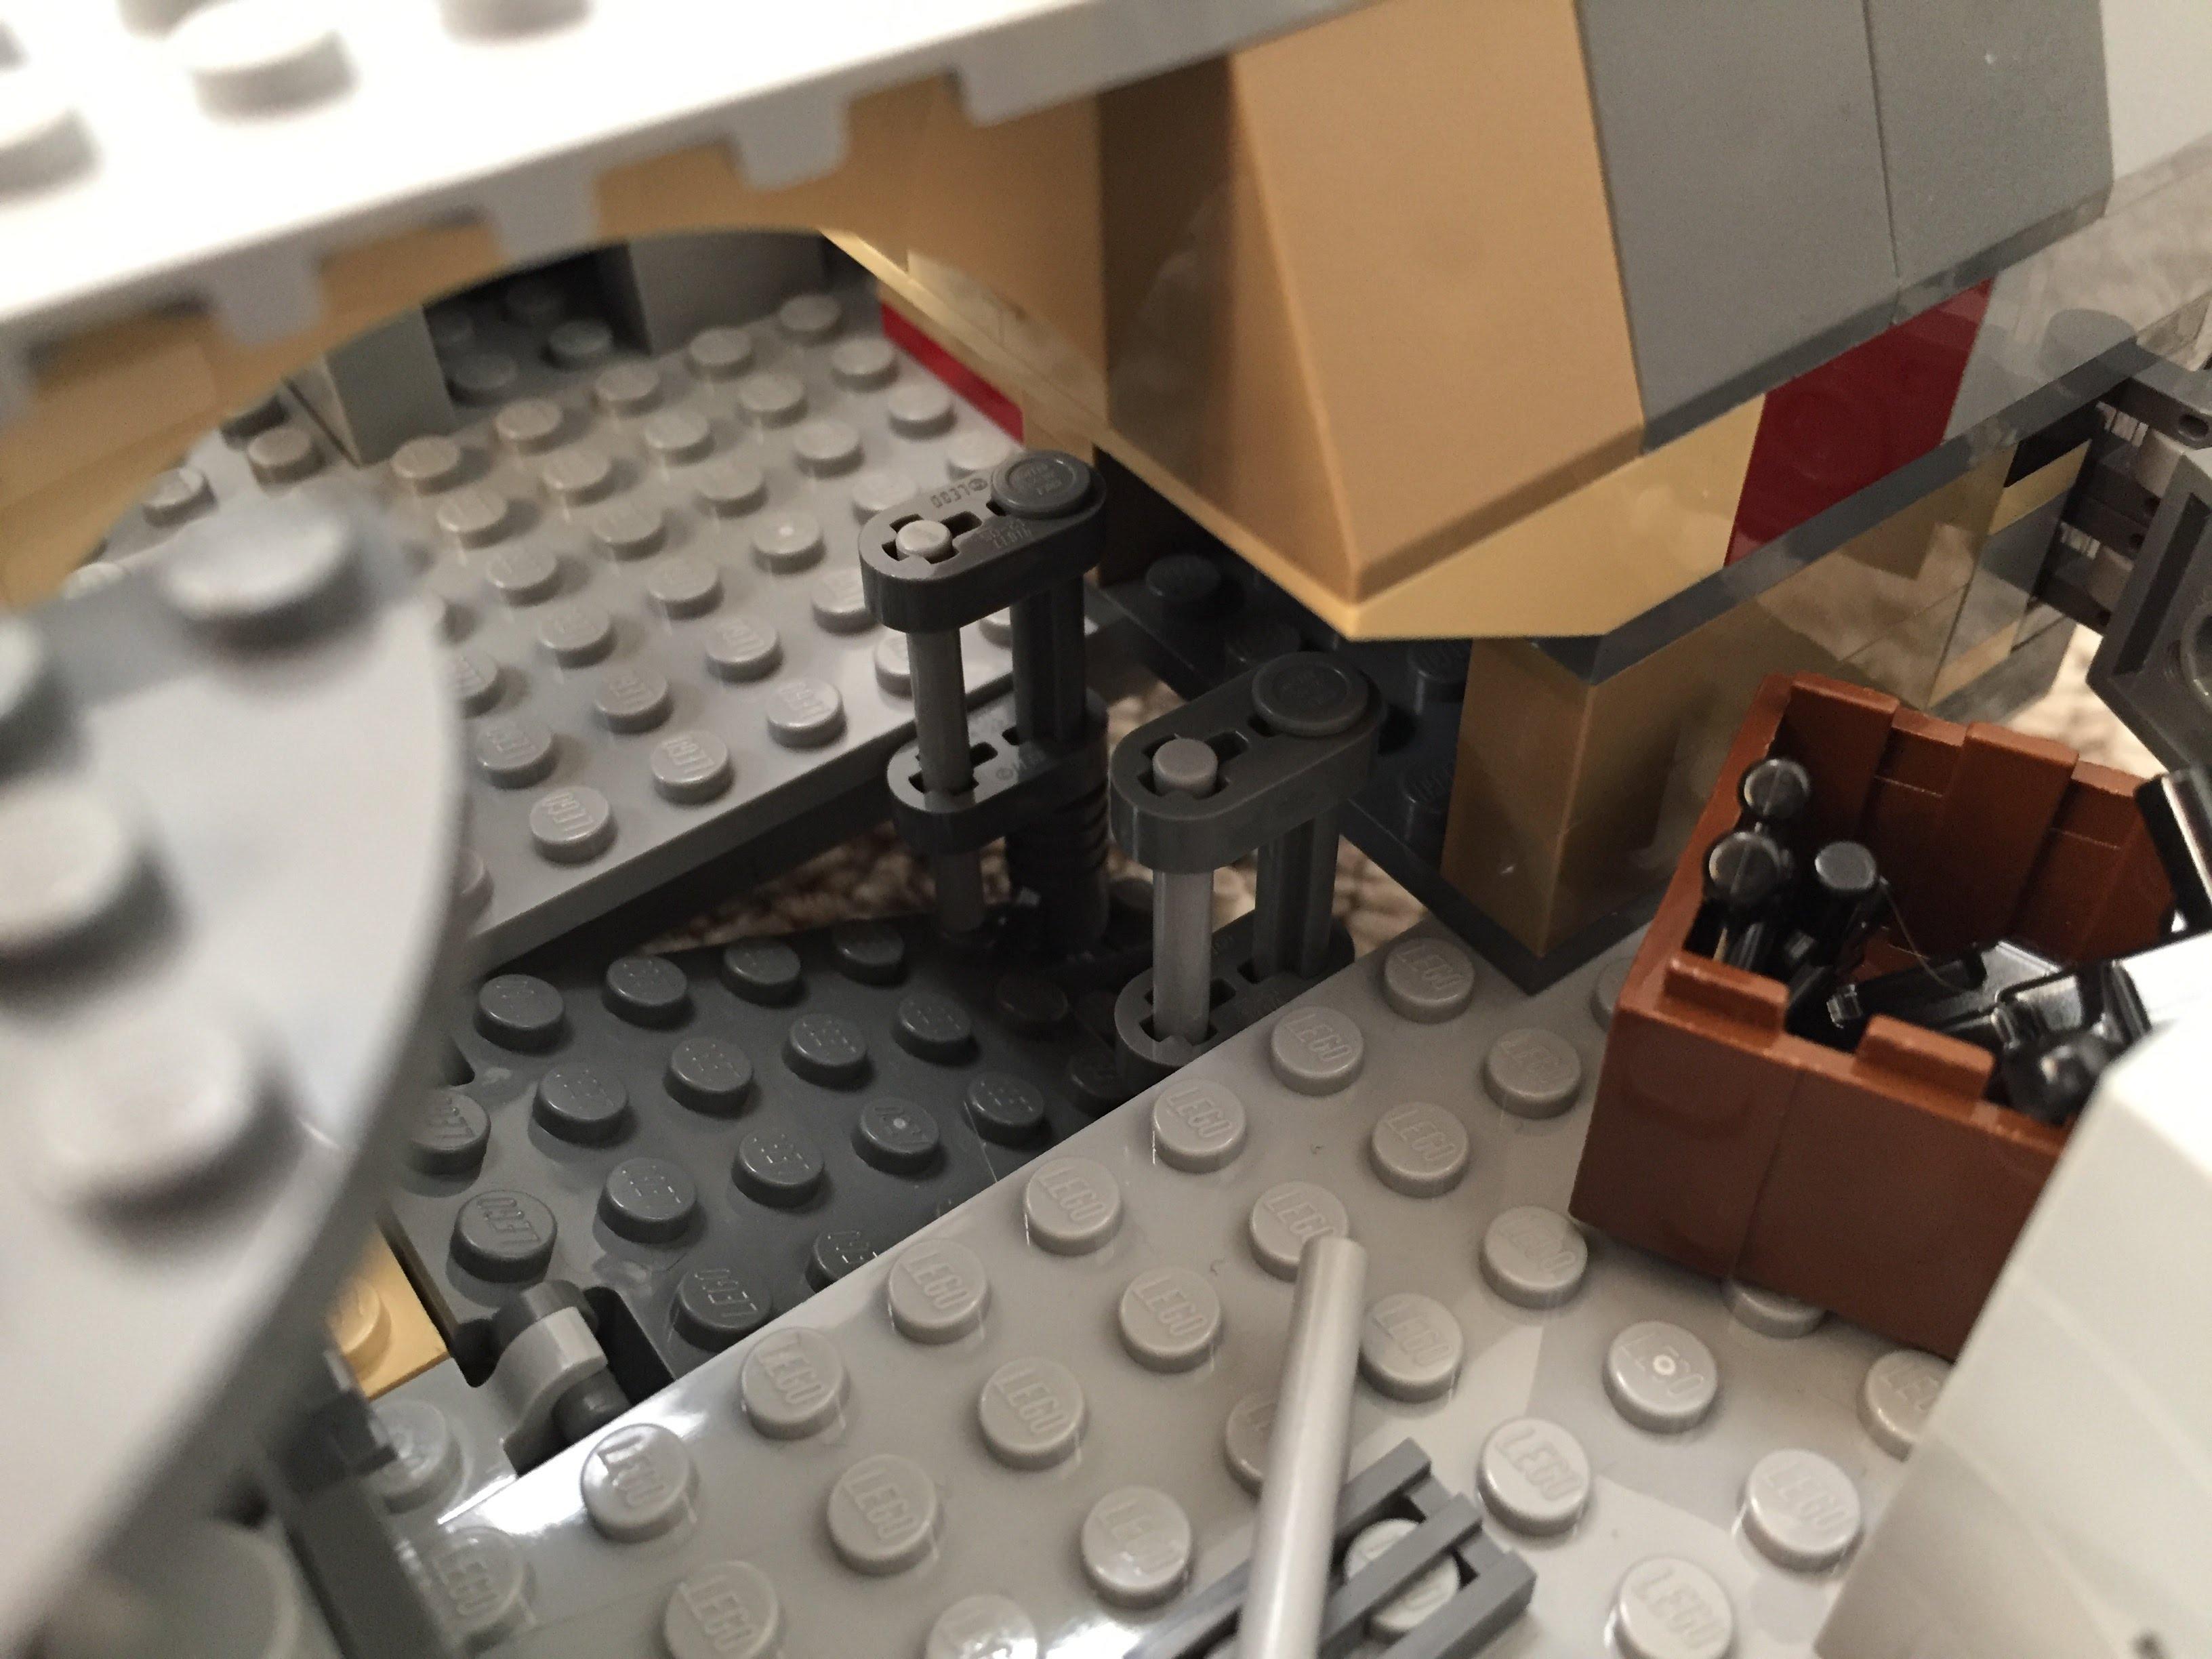 Millennium-Falcon-entryramp-interior-down2.jpg